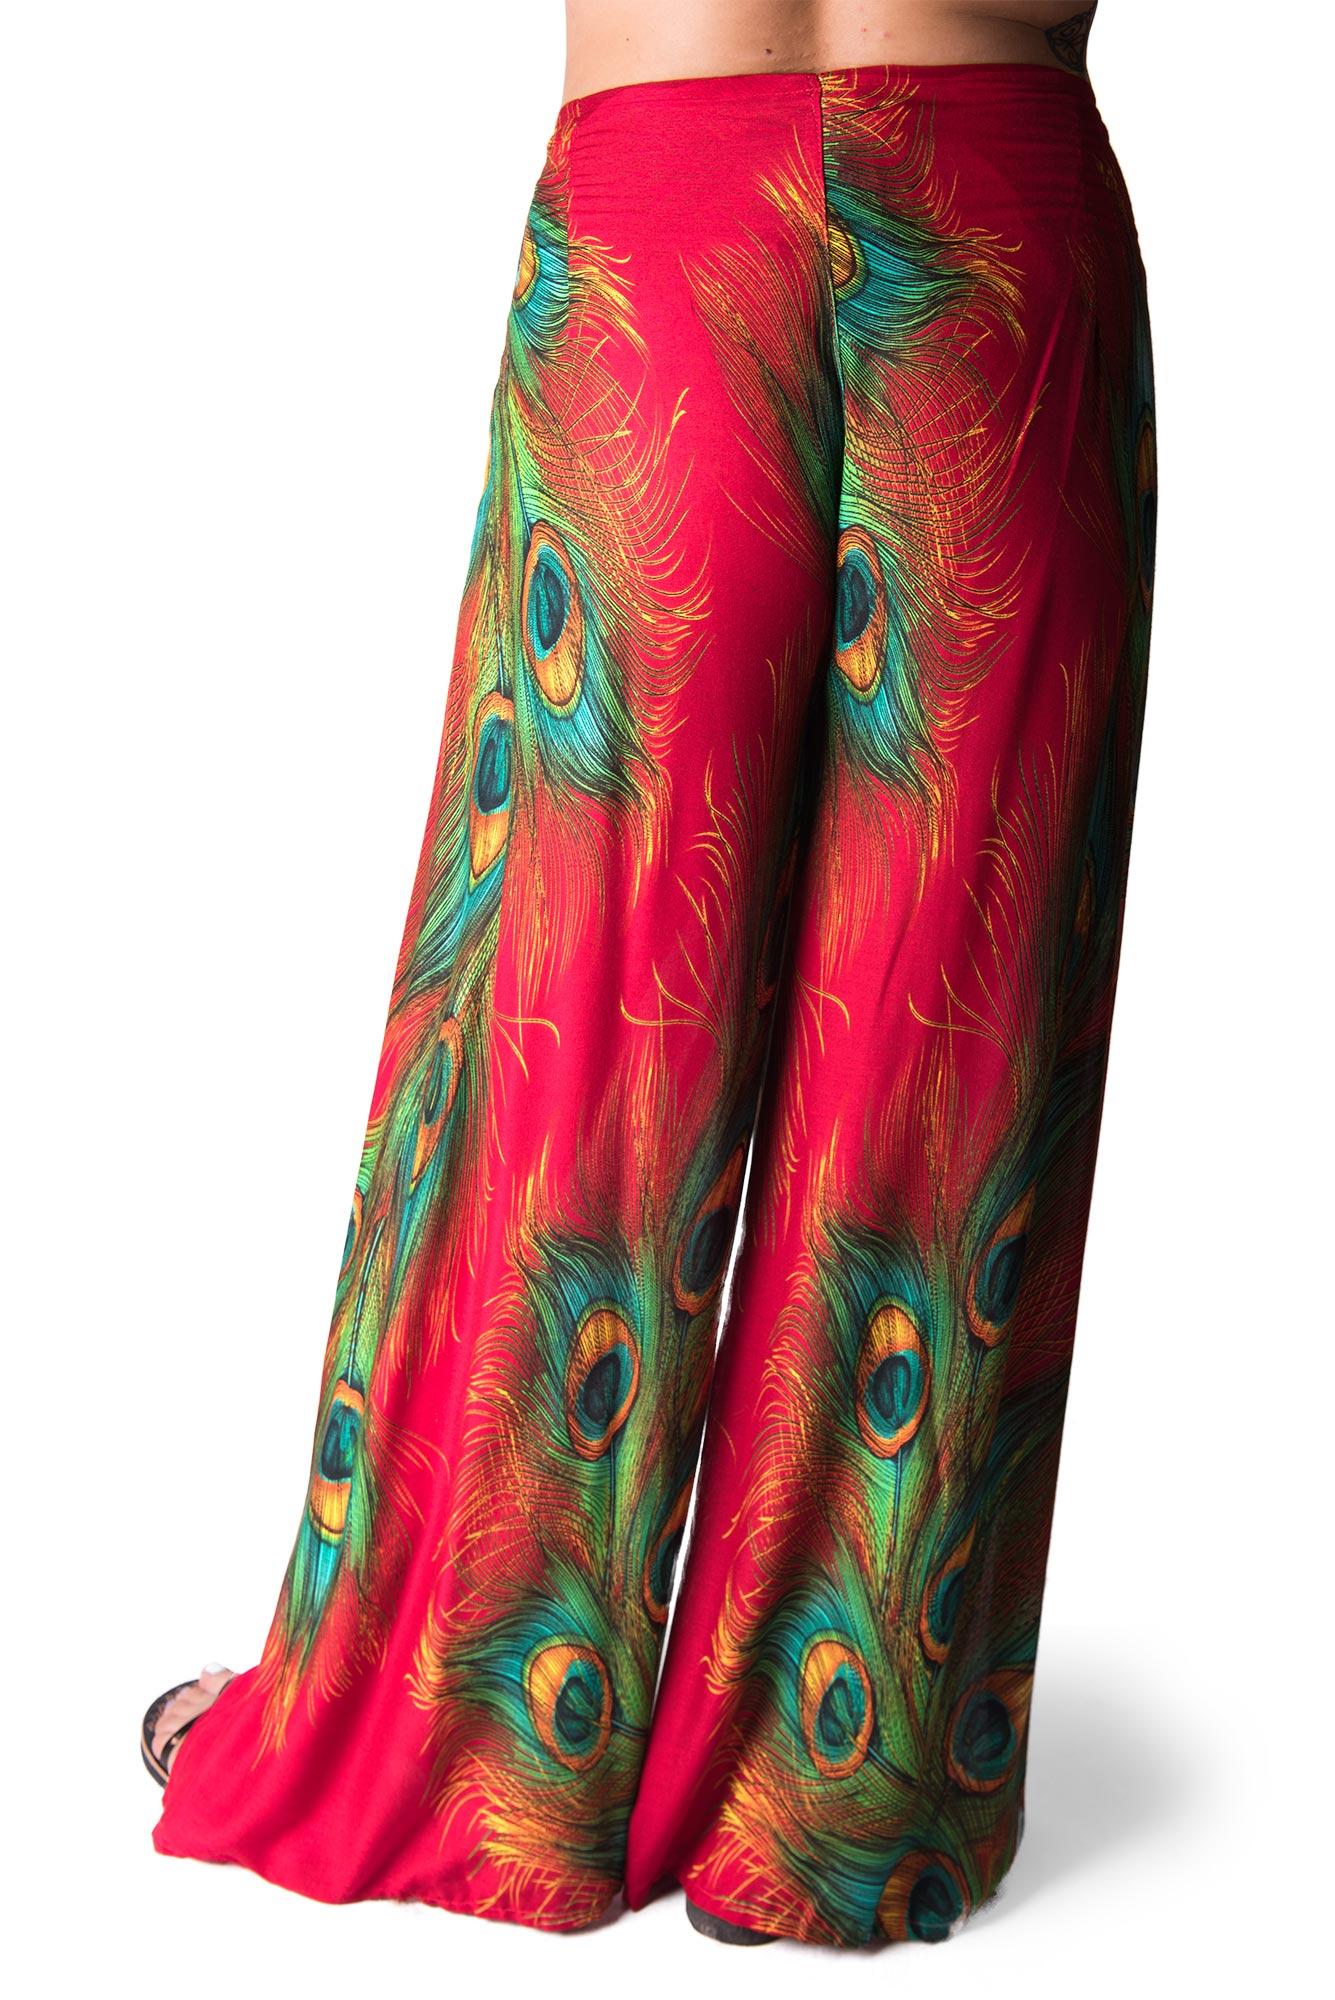 Wrap Pants Peacock Print, Red - 4504R